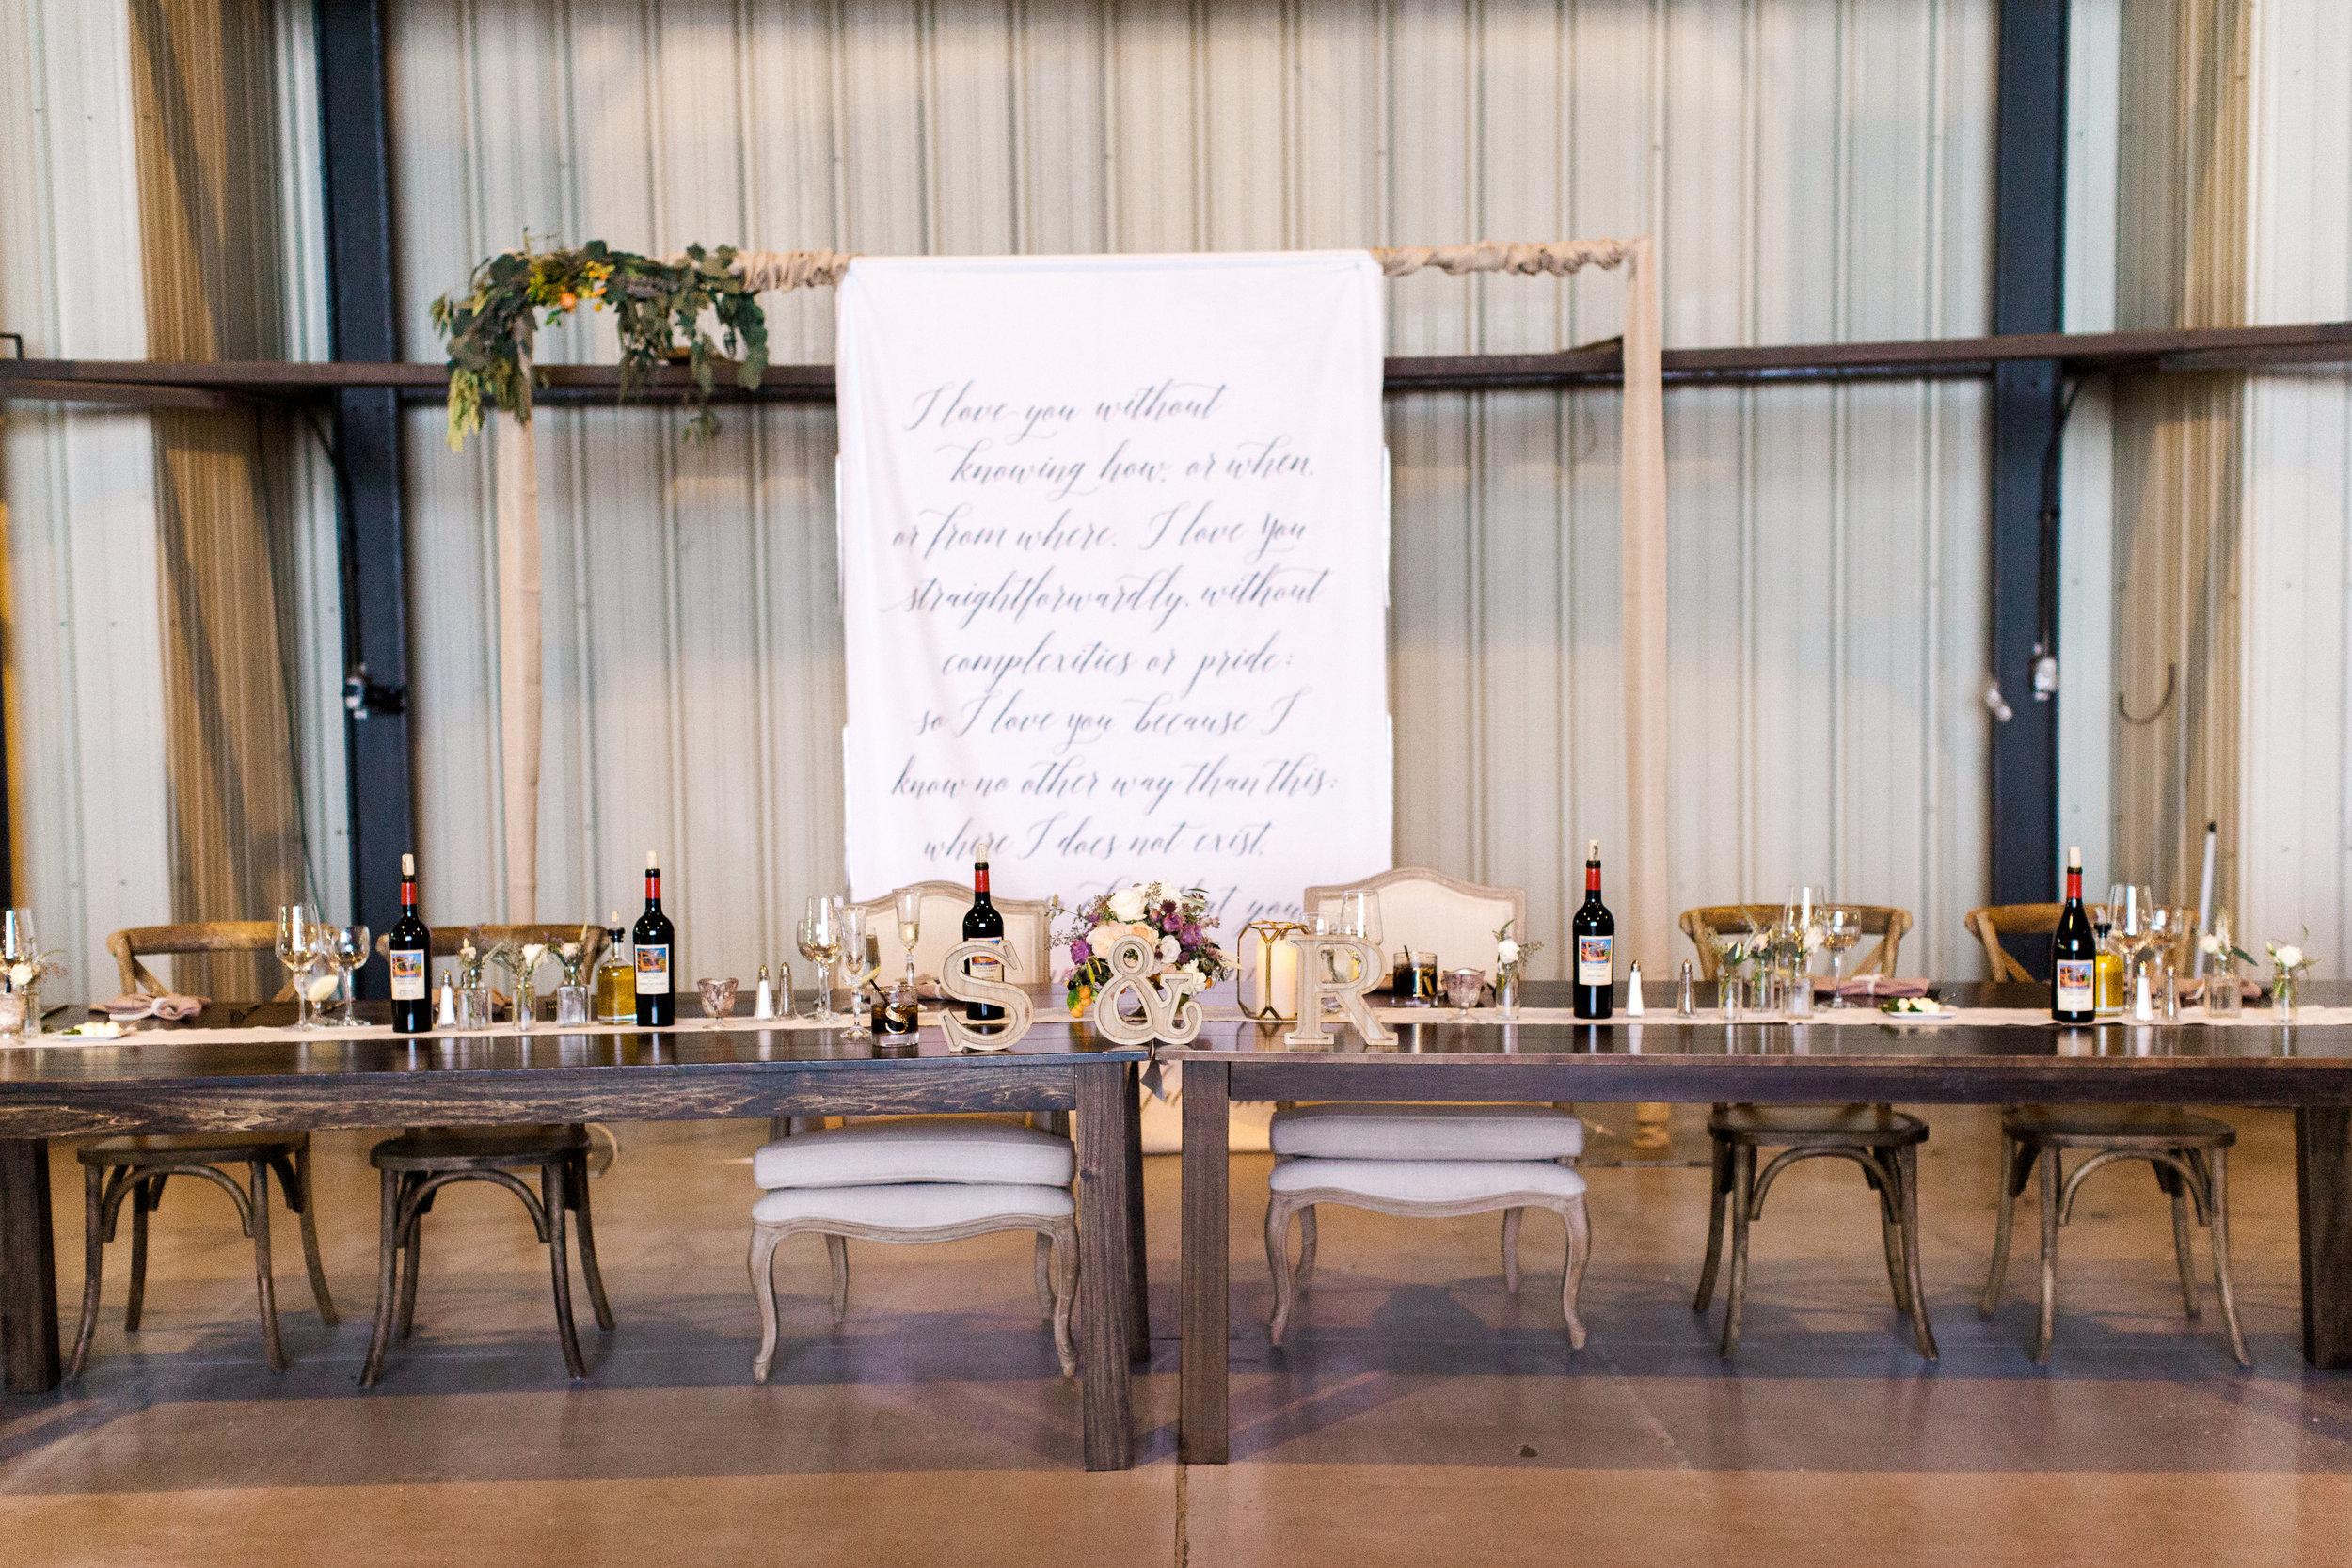 airport-hanger-wedding-at-attitude-aviation-in-livermore-94.jpg